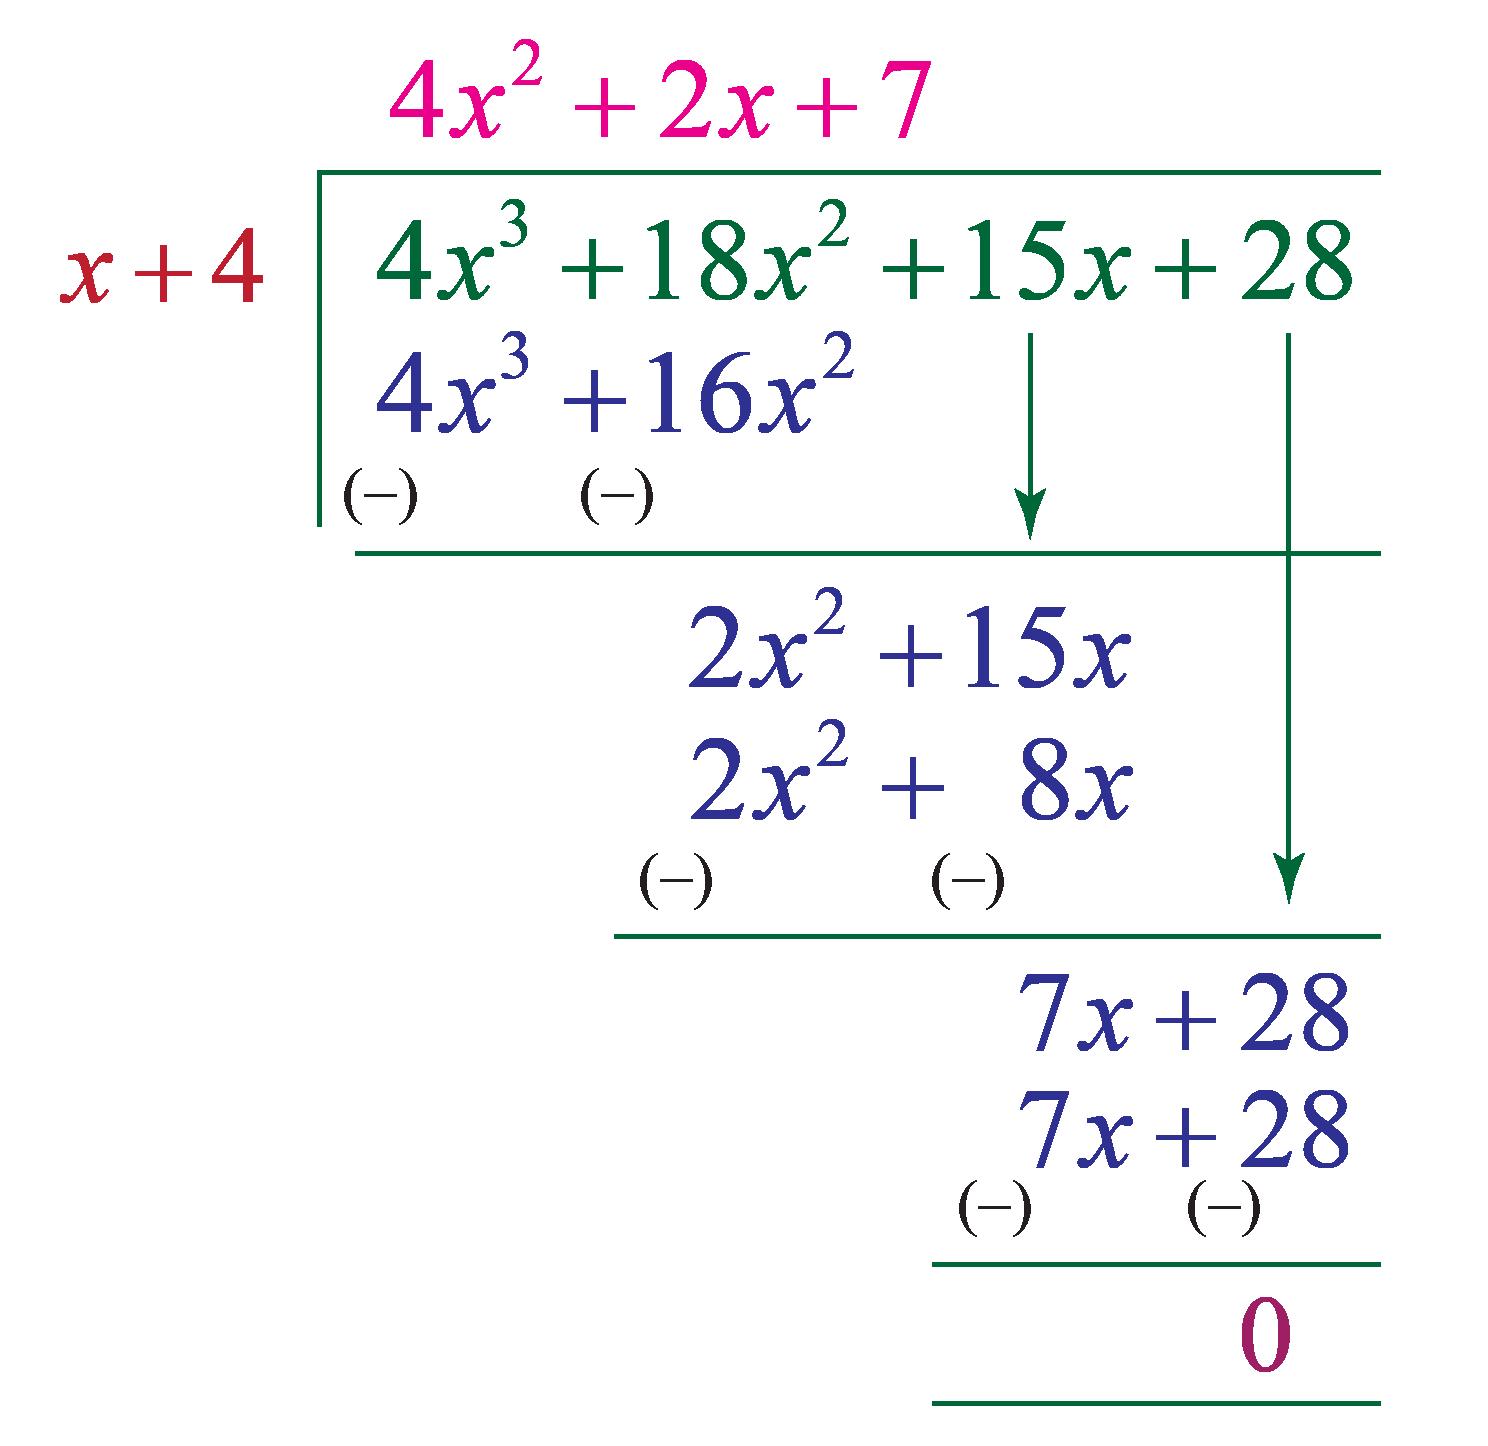 Dividing polynomials example 1